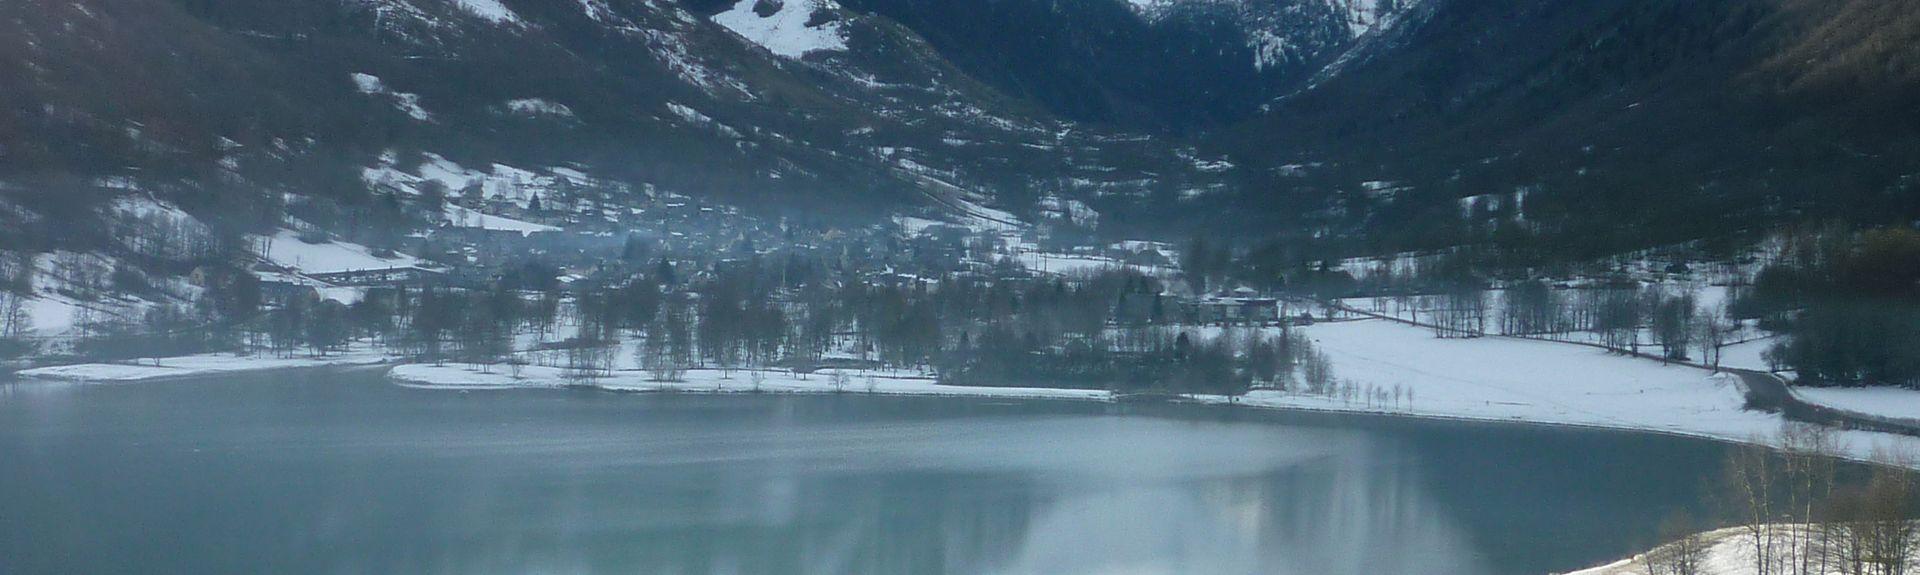 Cadeilhan-Trachere, Hautes-Pyrenees, Frankrike